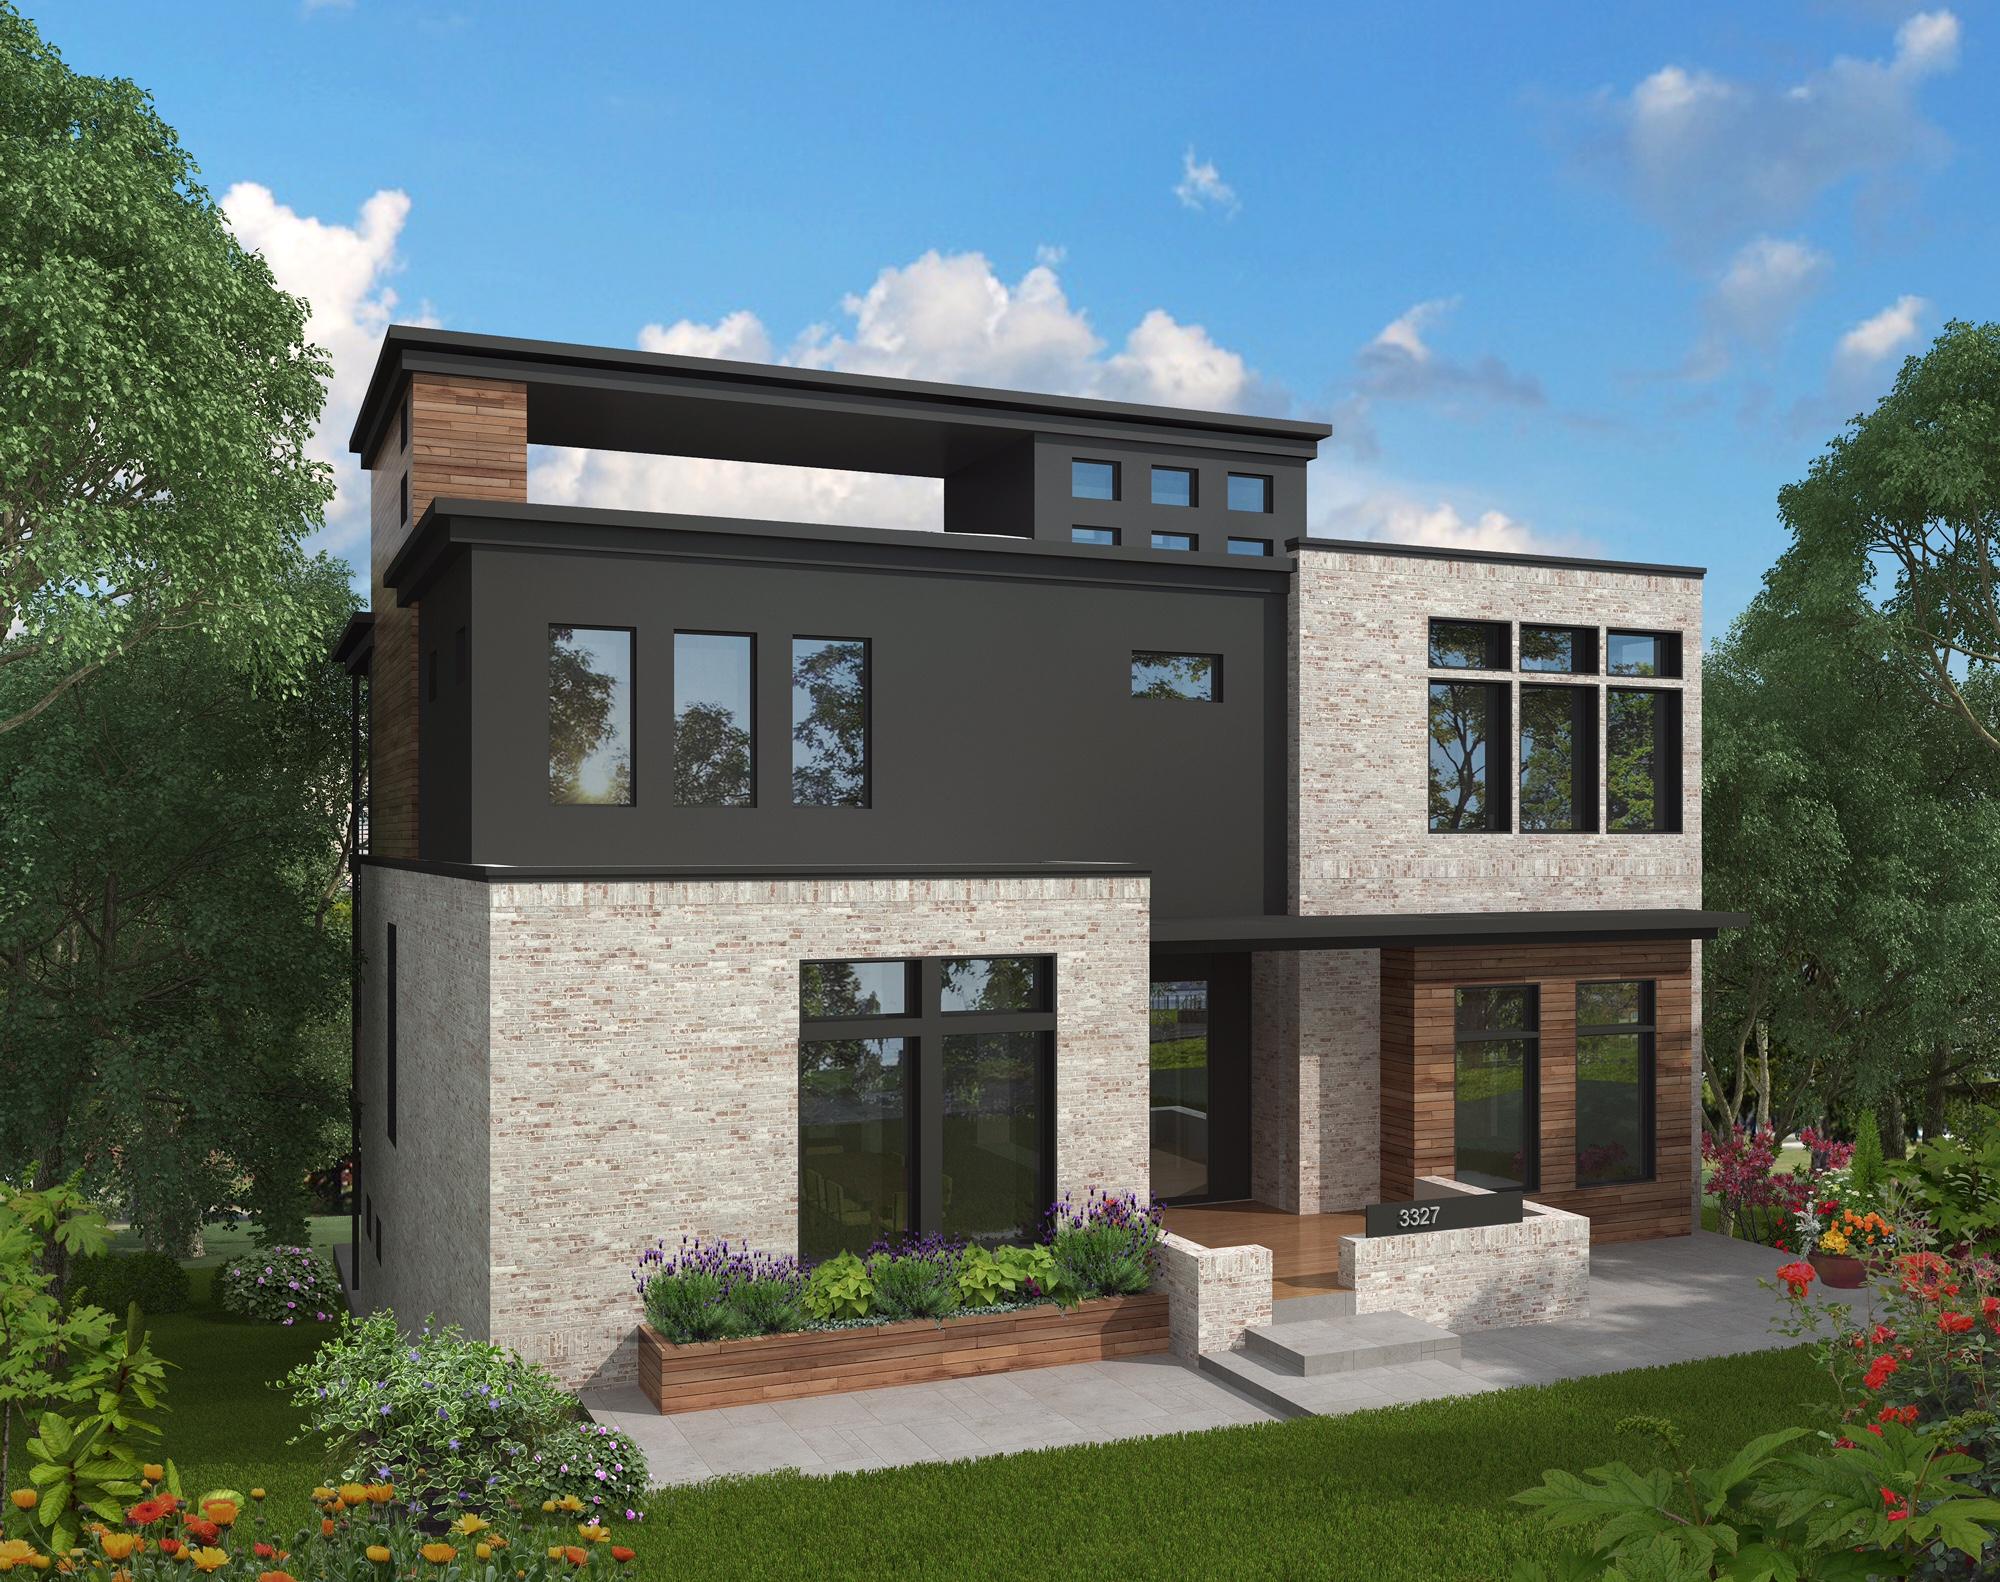 britt-development-group-3327-acklen-avenue-nashville-real-estate.jpg